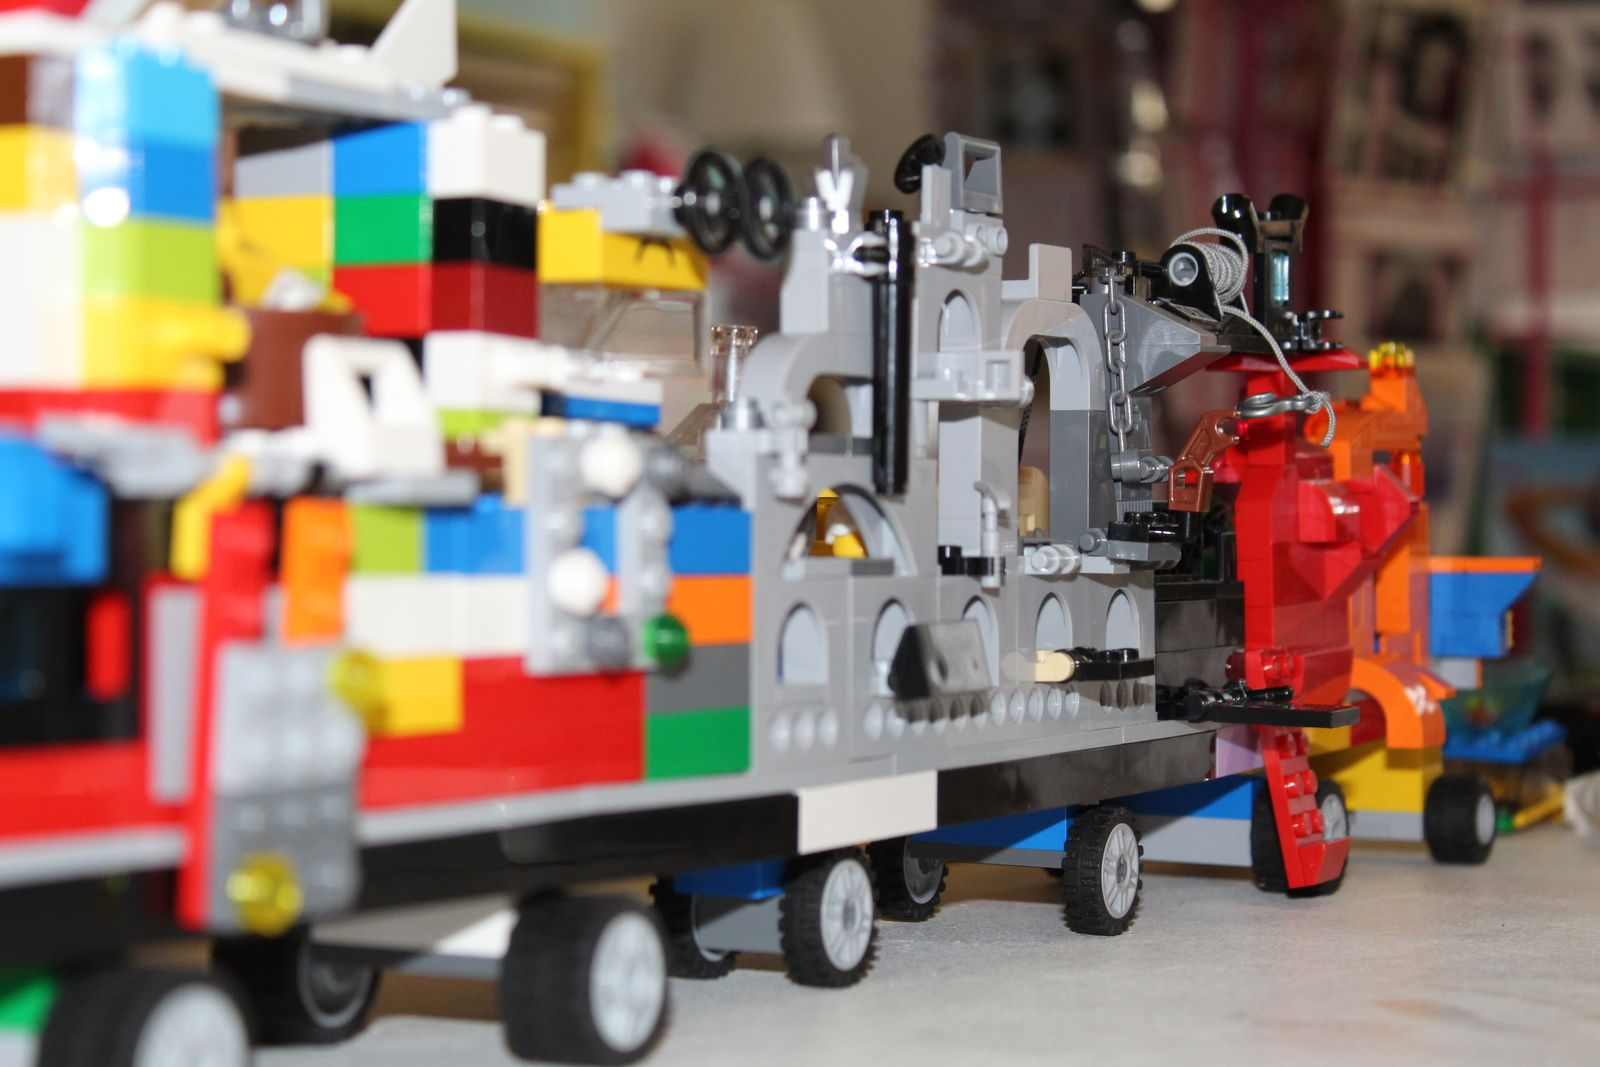 #lego #vehicule #train #enfant #jeu #charlotteblabla blog